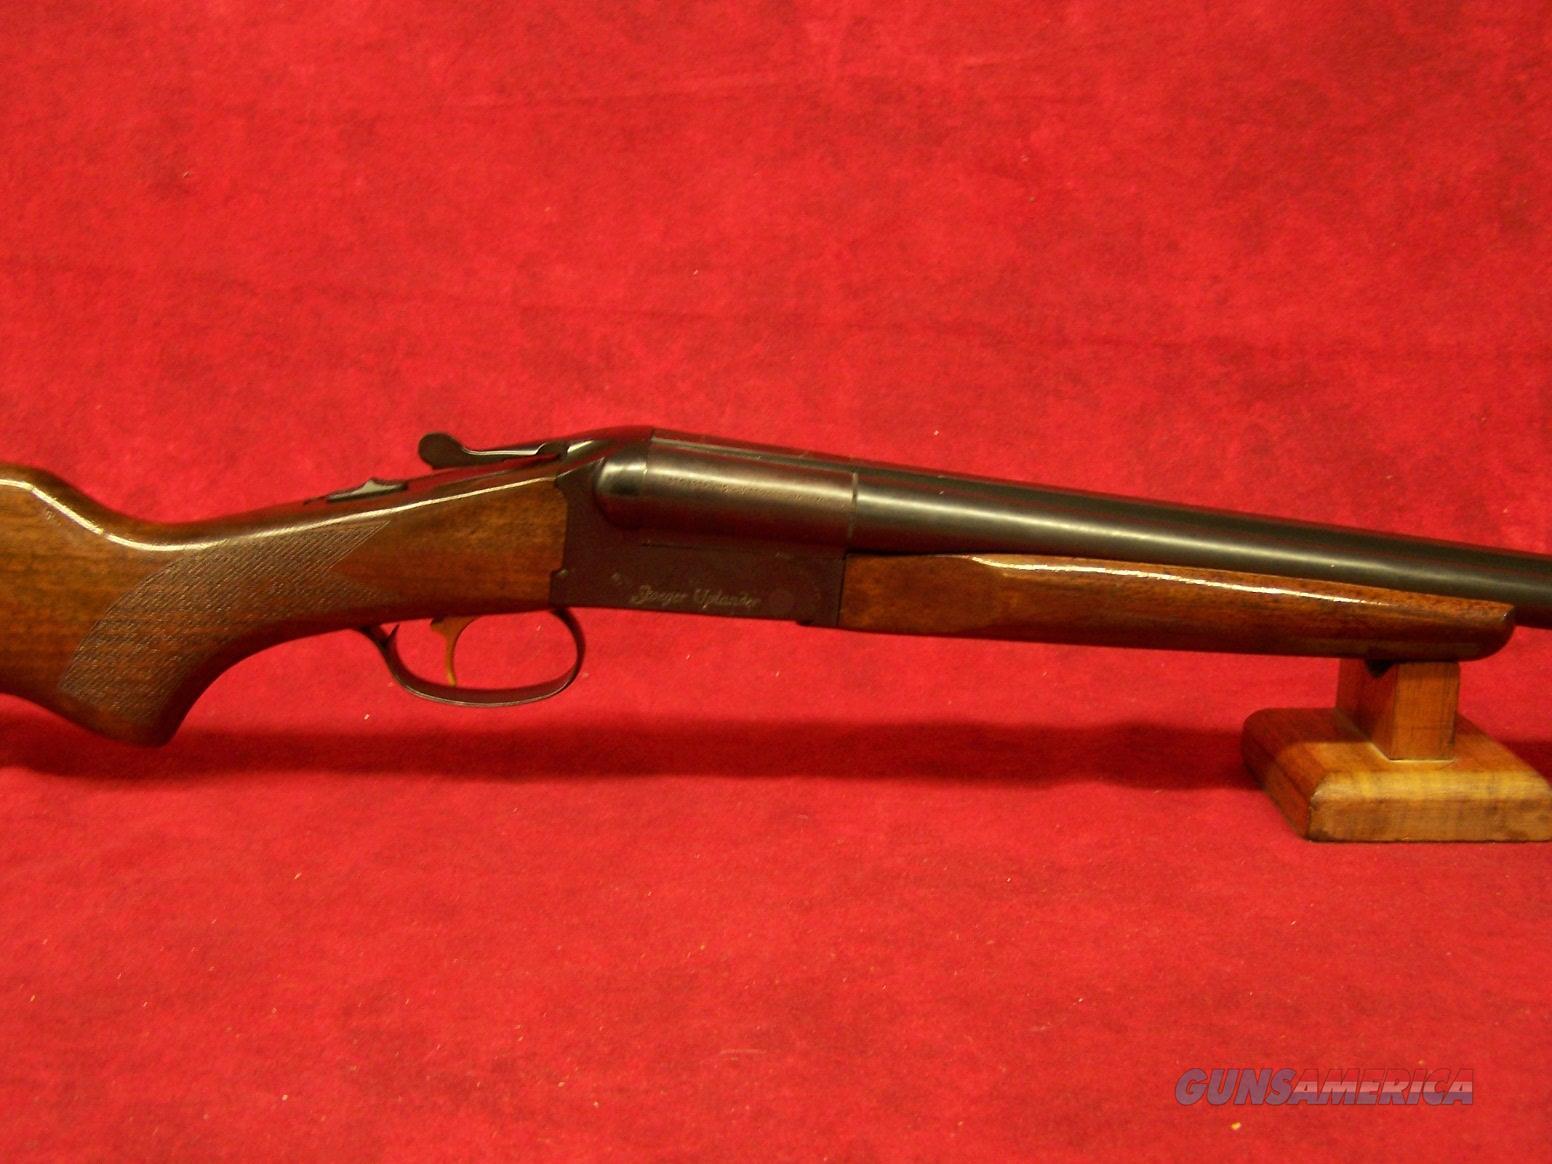 "Stoeger Uplander Supreme 20Ga 3"" SxS AA-Grade Gloss Walnut 26"" Barrel (31115)  Guns > Shotguns > Stoeger Shotguns"